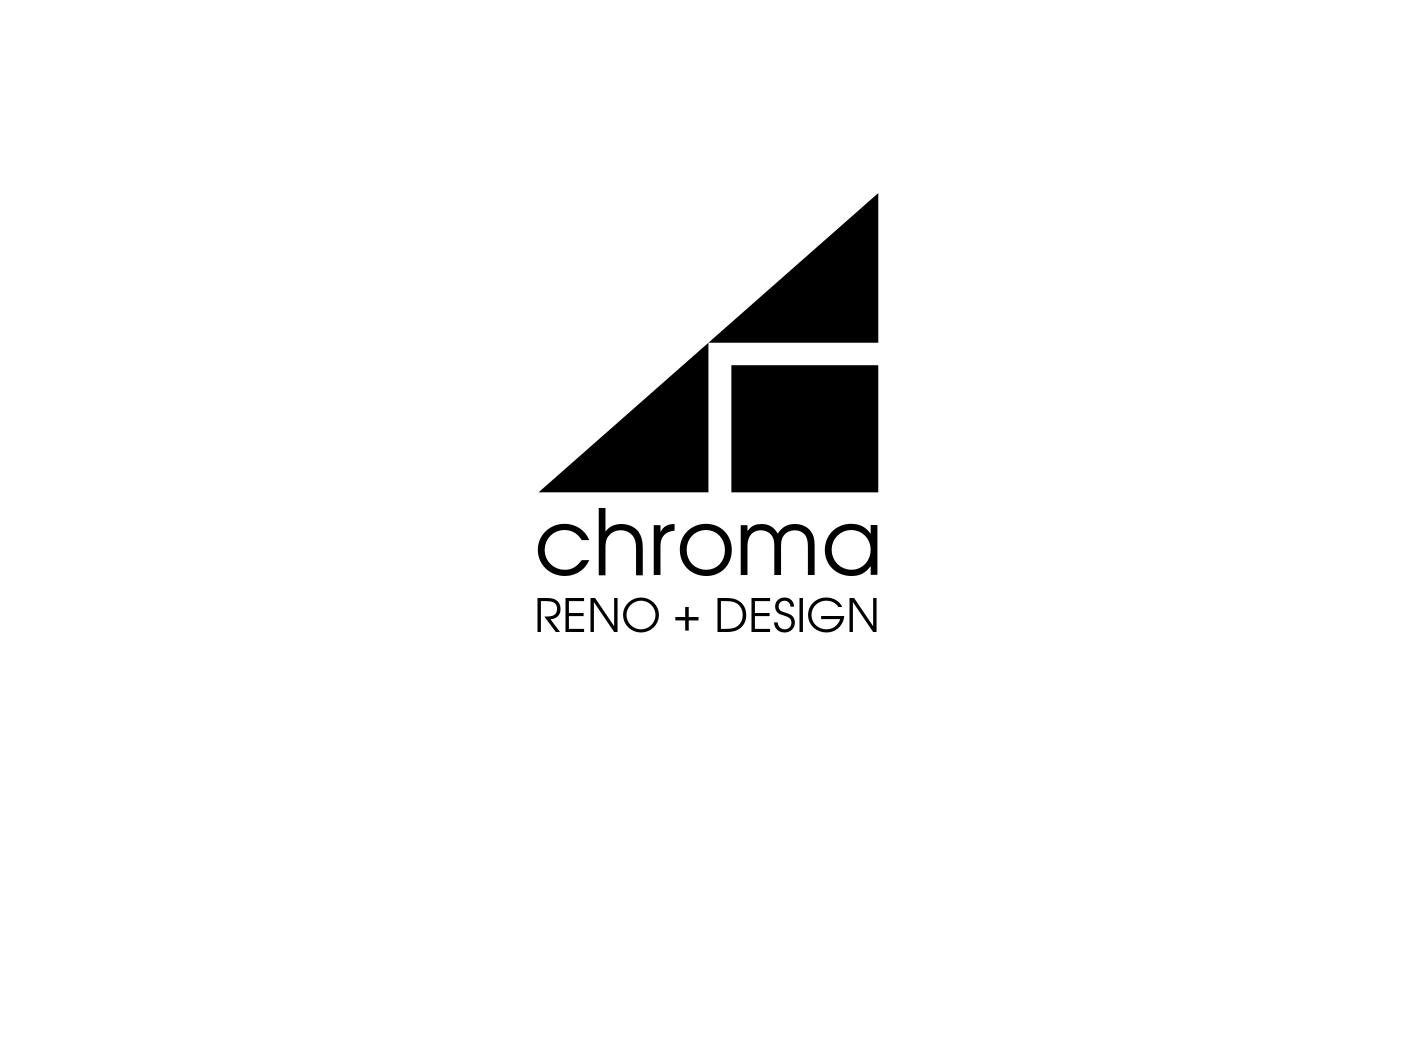 Logo Design by JaroslavProcka - Entry No. 230 in the Logo Design Contest Inspiring Logo Design for Chroma Reno+Design.